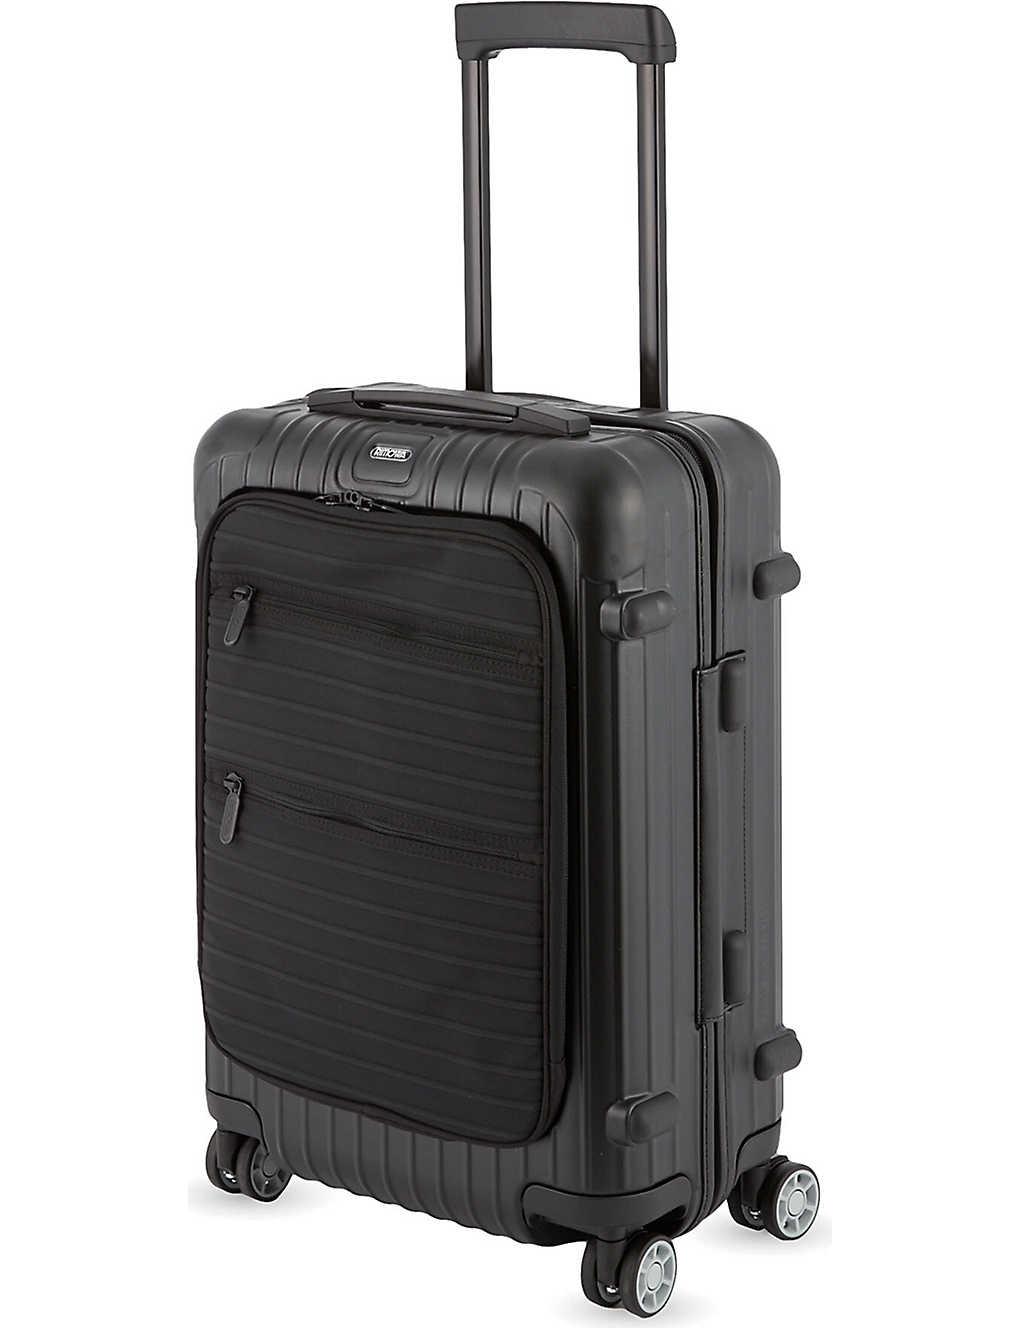 RIMOWA - Cabin luggage - Luggage - Bags - Selfridges | Shop Online